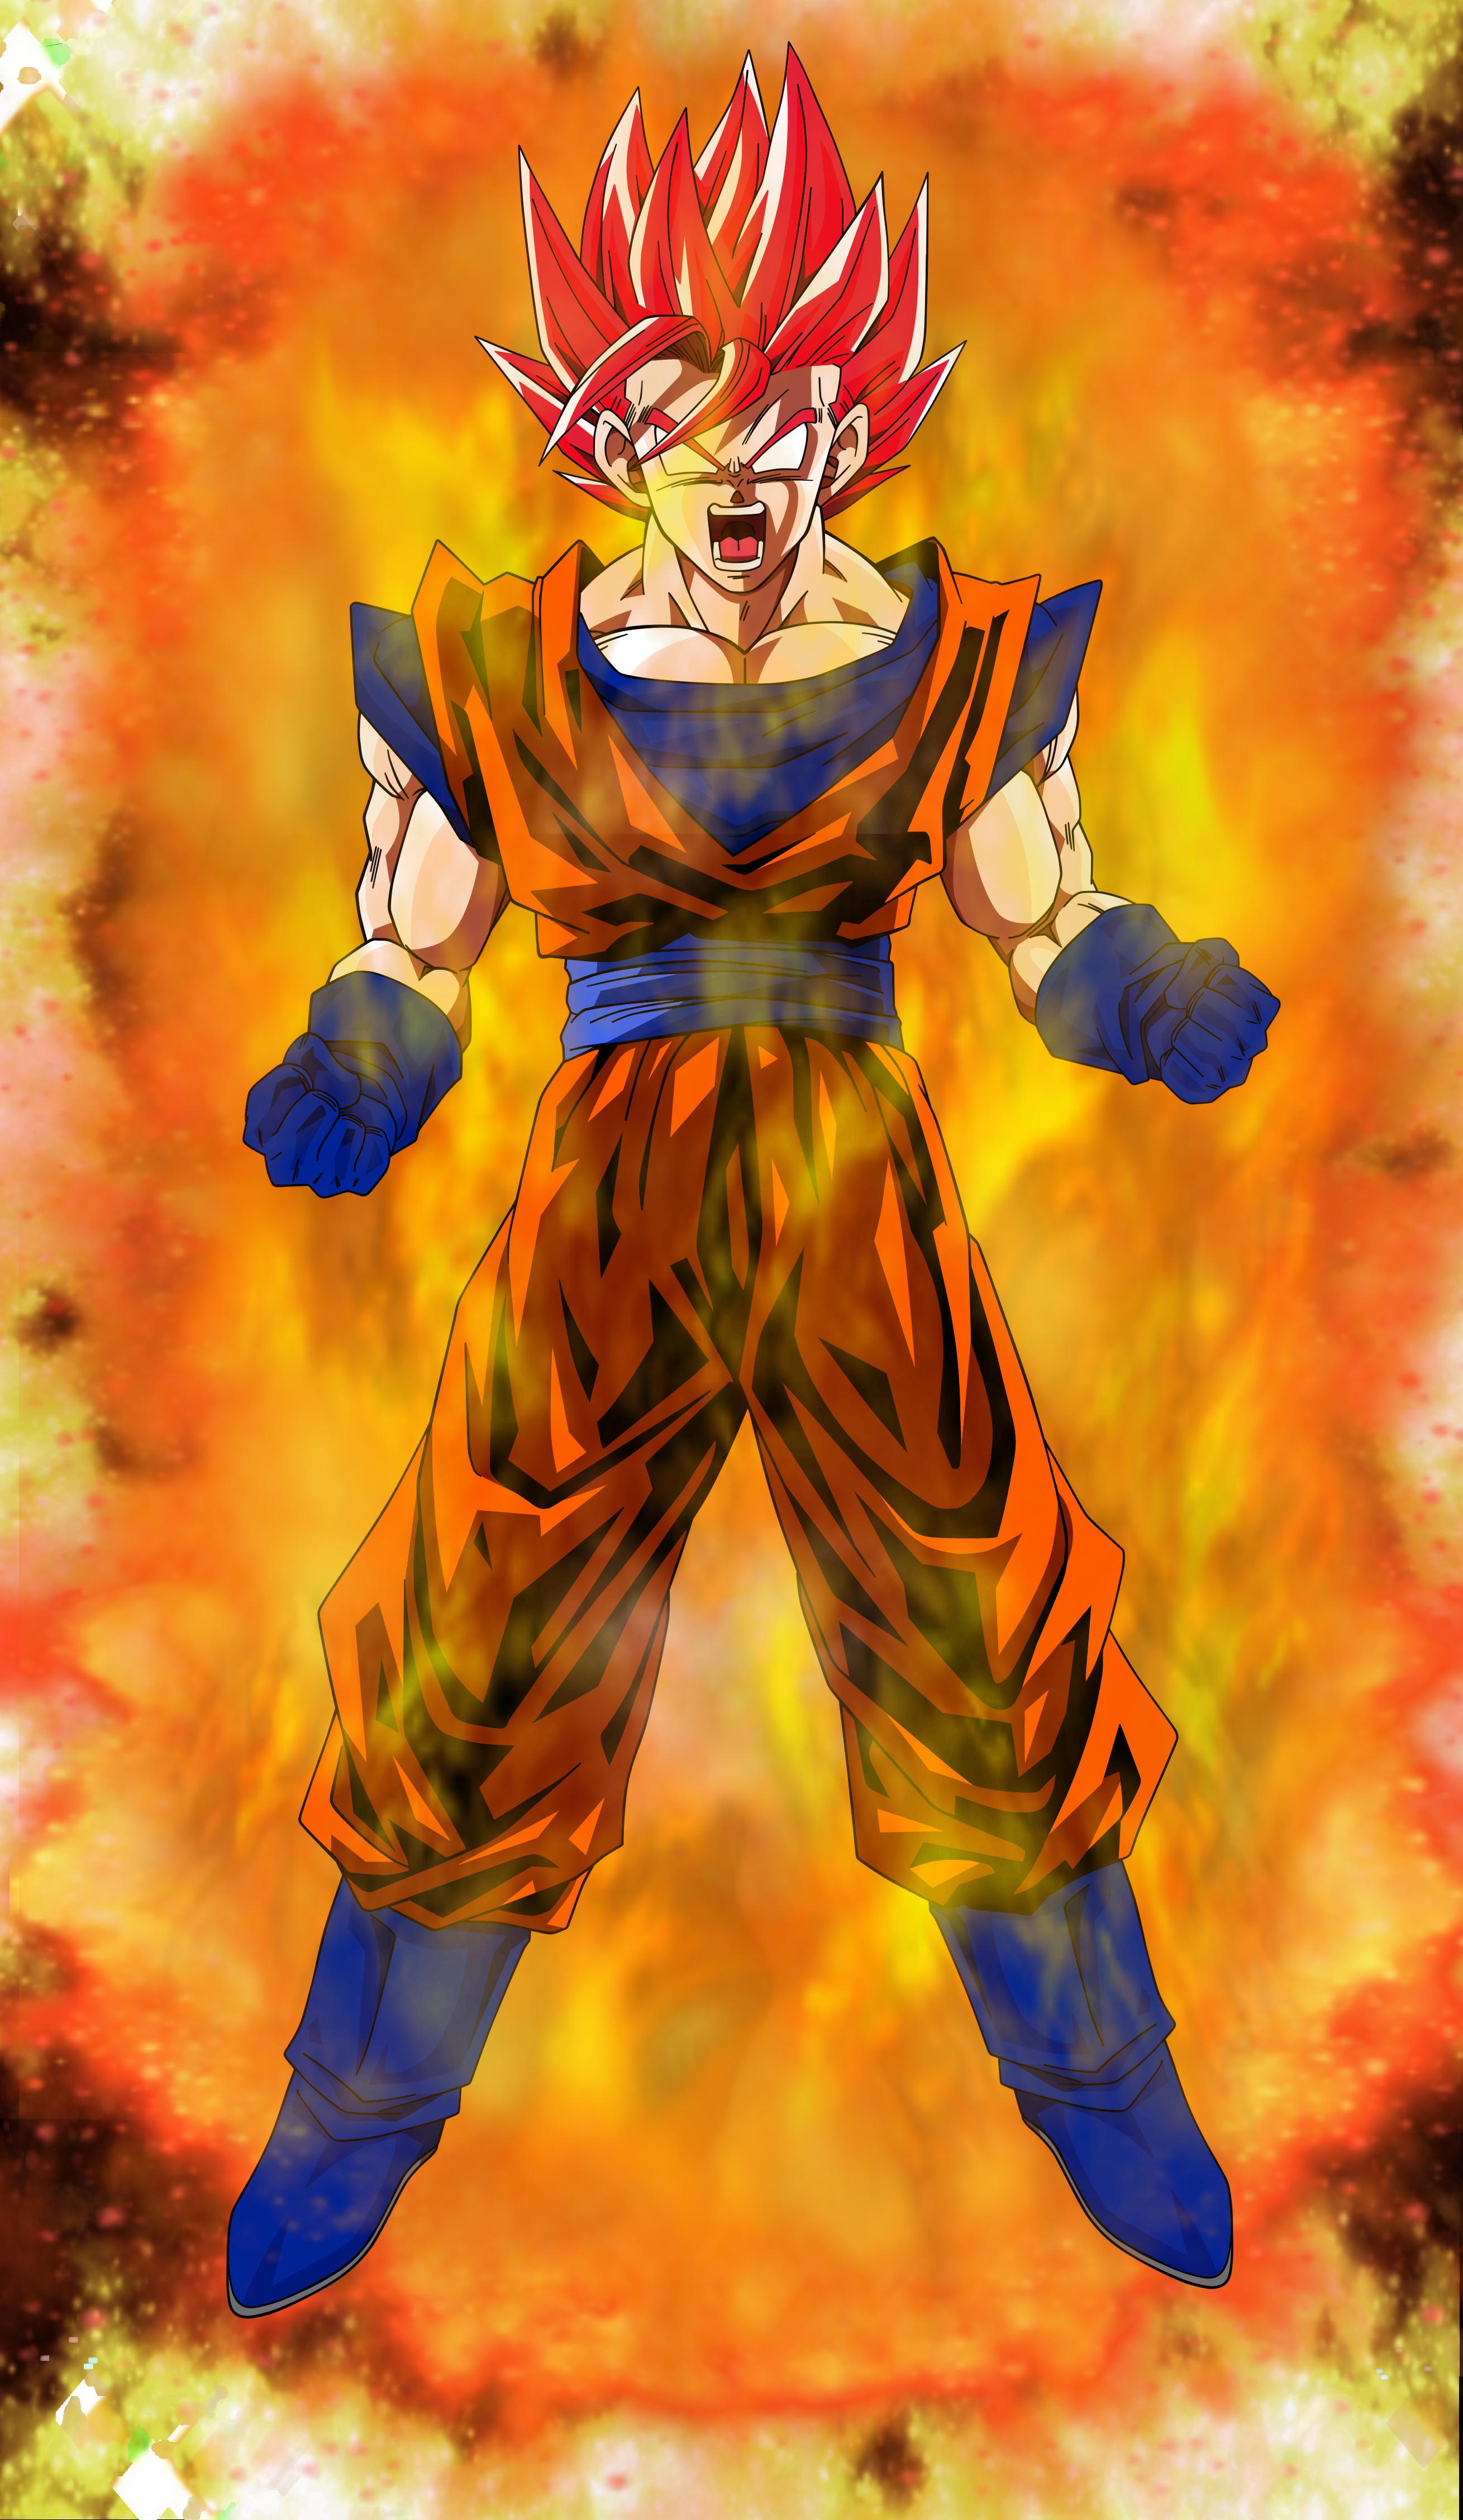 Super Saiyan God Goku Power Up By Elitesaiyanwarrior On Deviantart